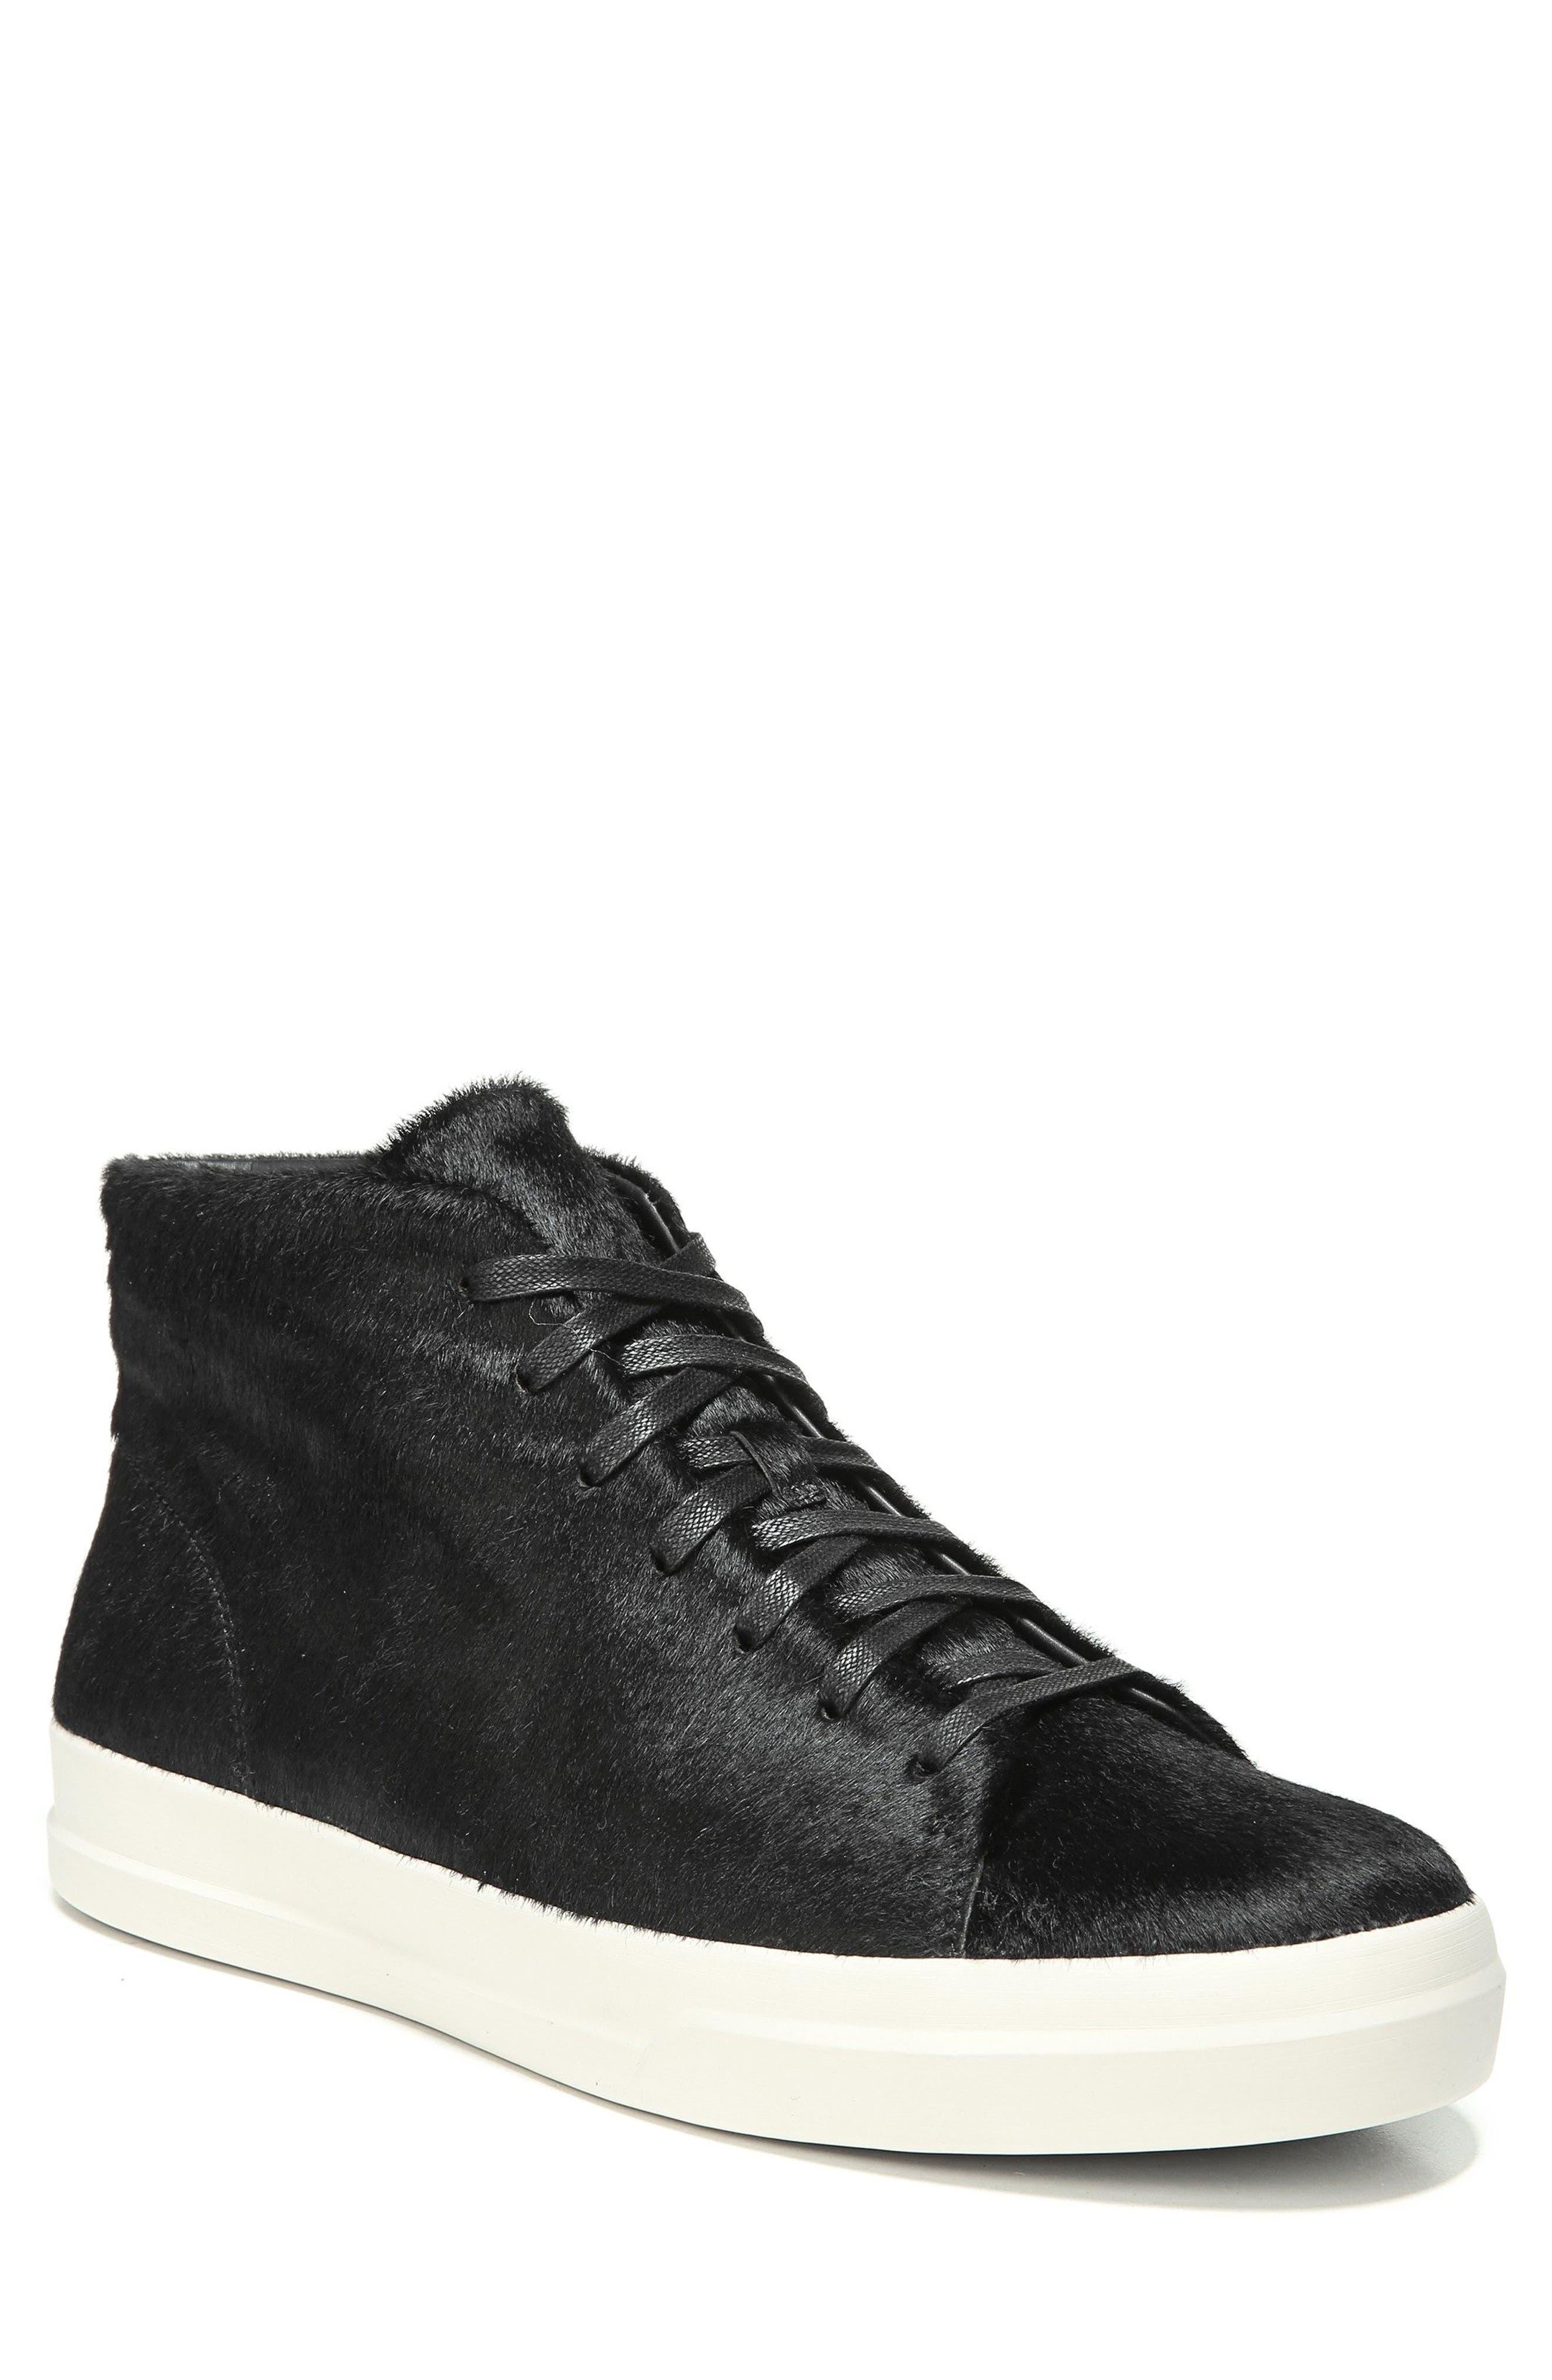 Cullen Sneaker,                         Main,                         color, 002